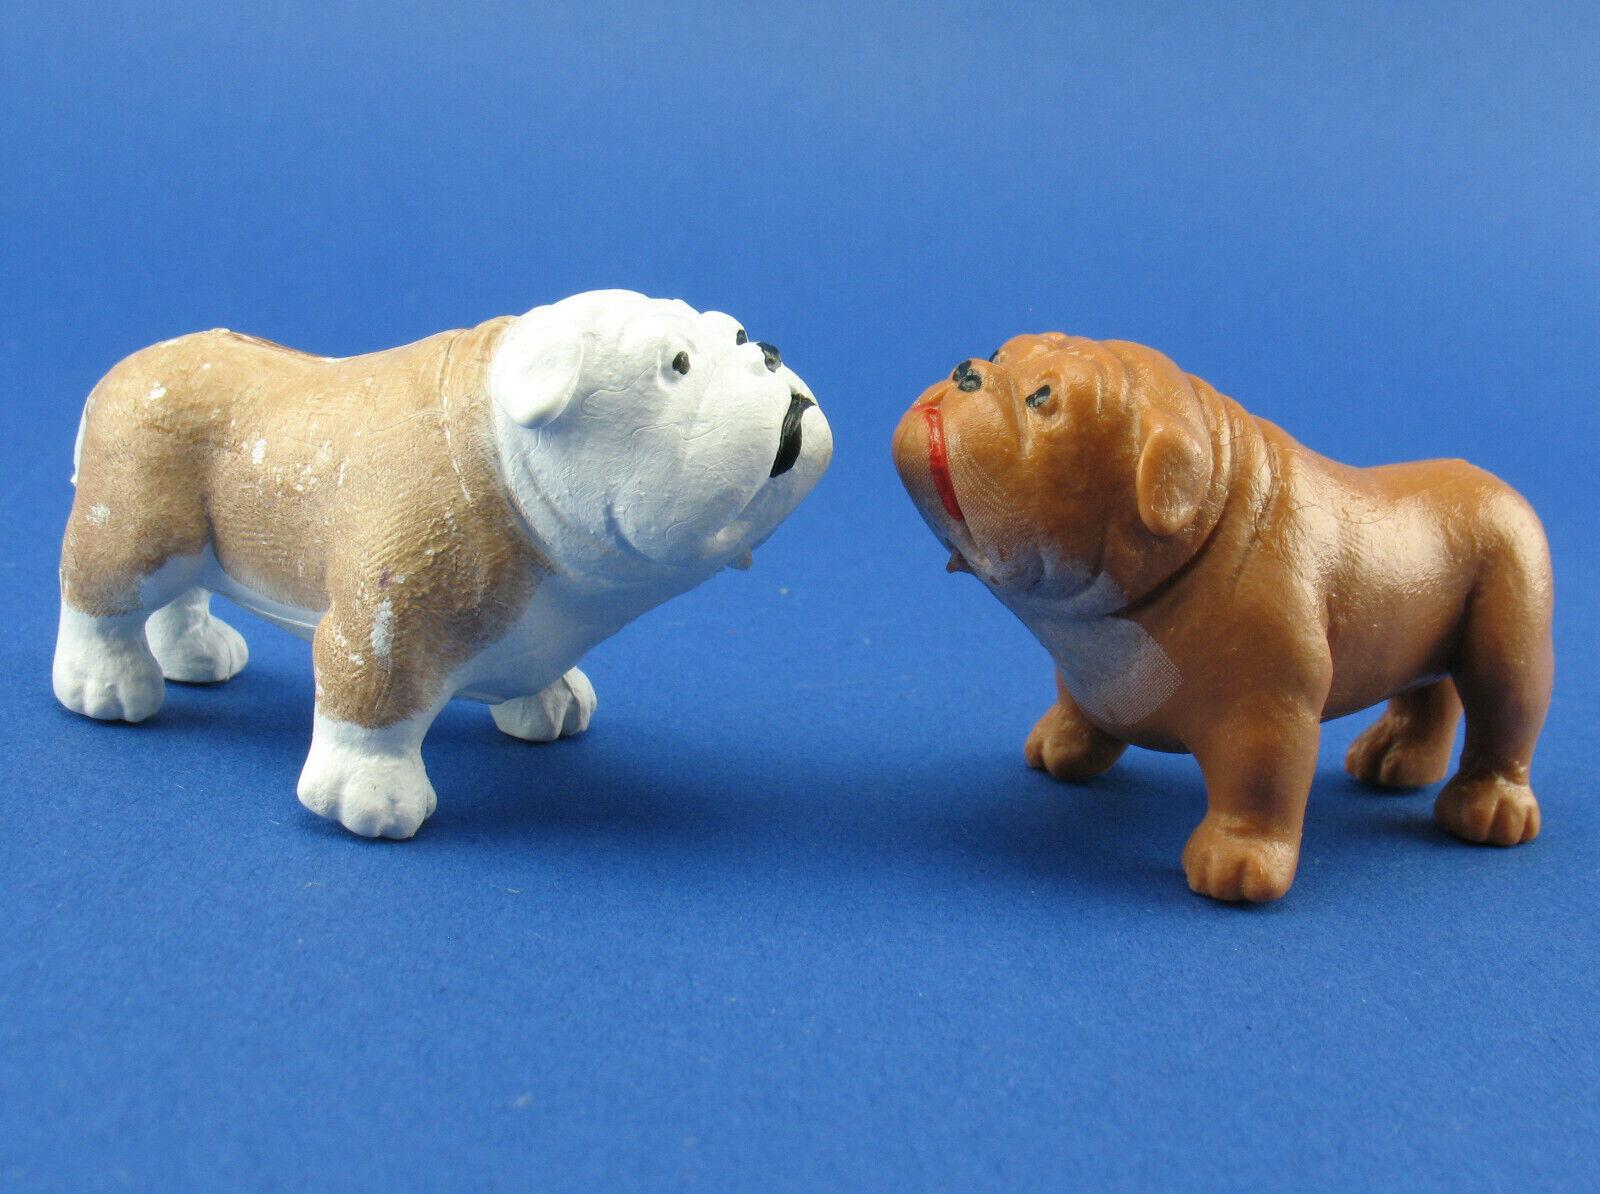 2x Schleich CLASSICS Hunde - 12507 + 12508 Bulldoge hell + dunkel - Bullog - Dog